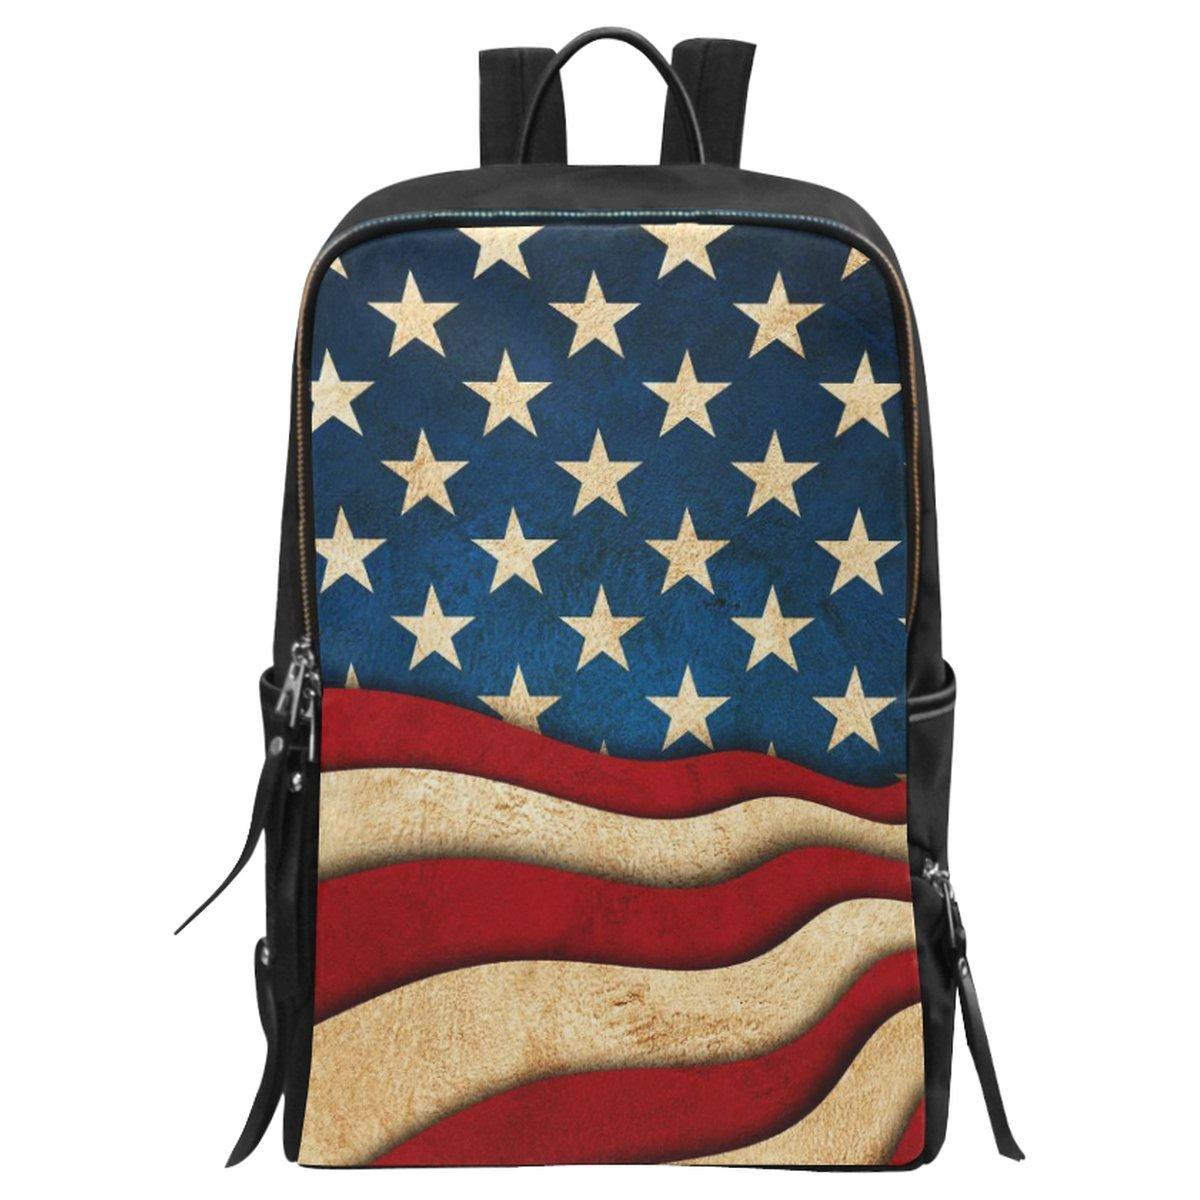 296b2b5b9c InterestPrint American flag School Casual Travel Backpack School Bag Travel  Daypack lovely